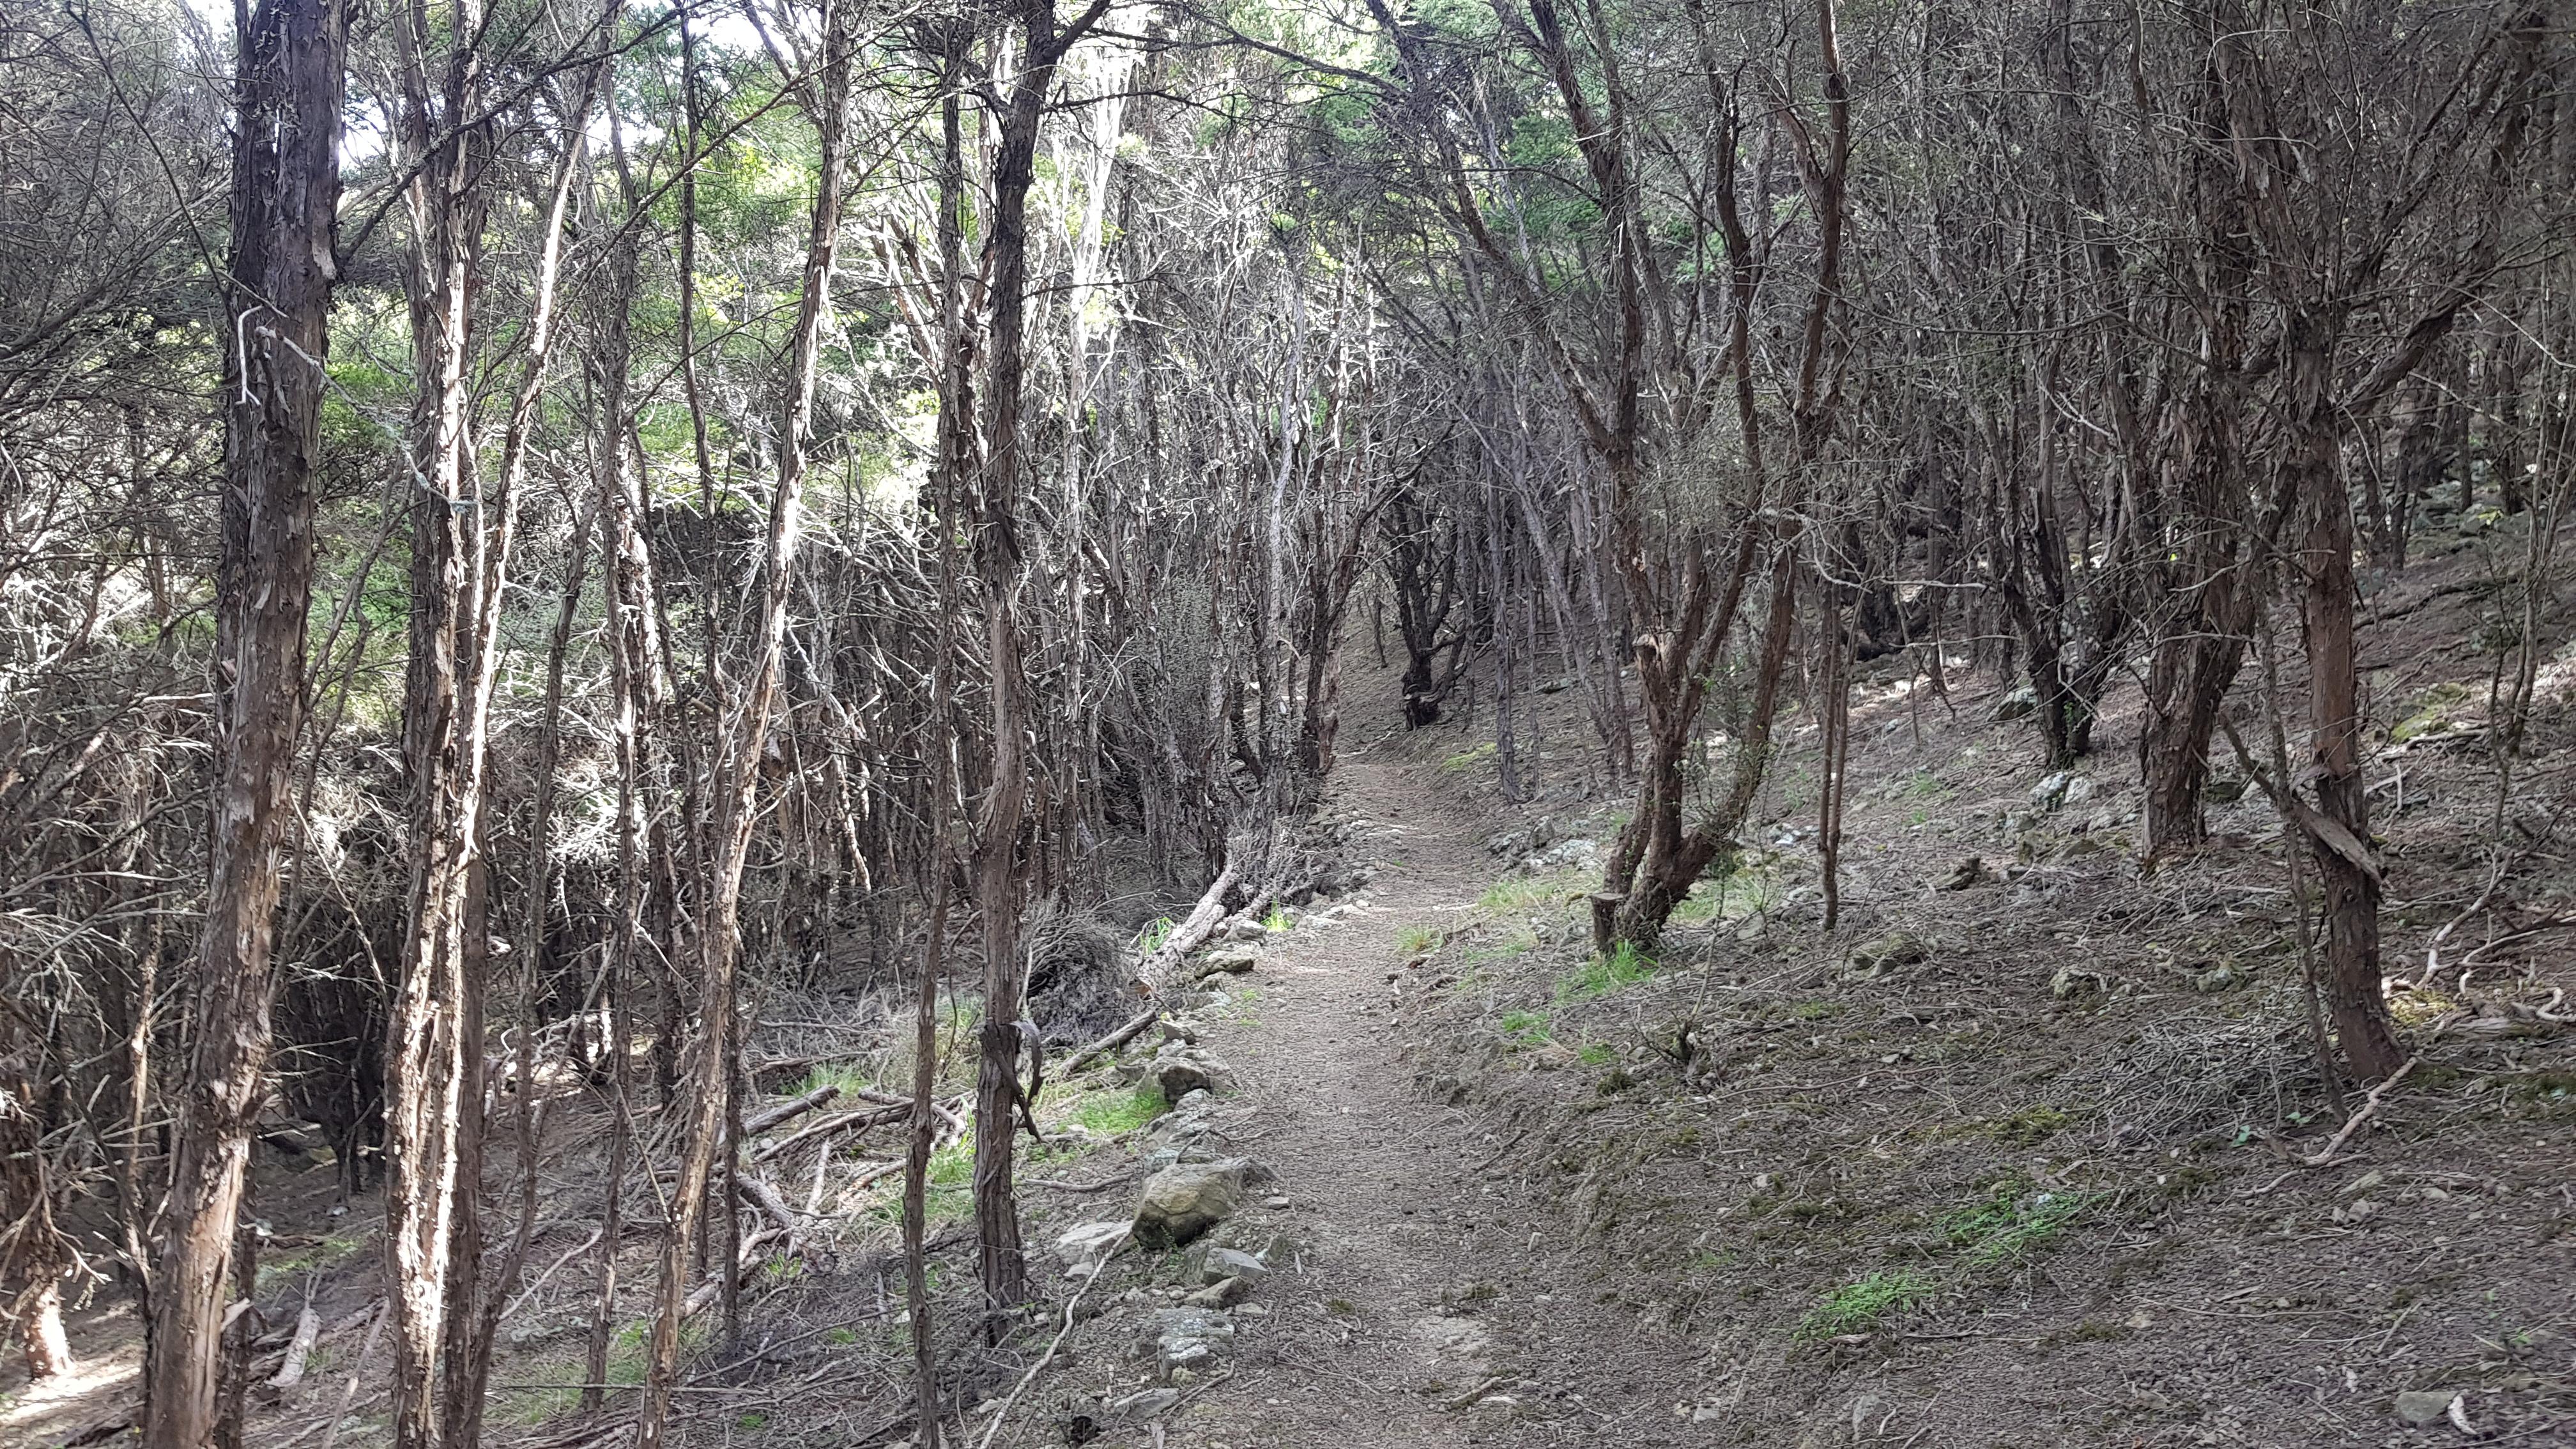 Blairich mountain bike track